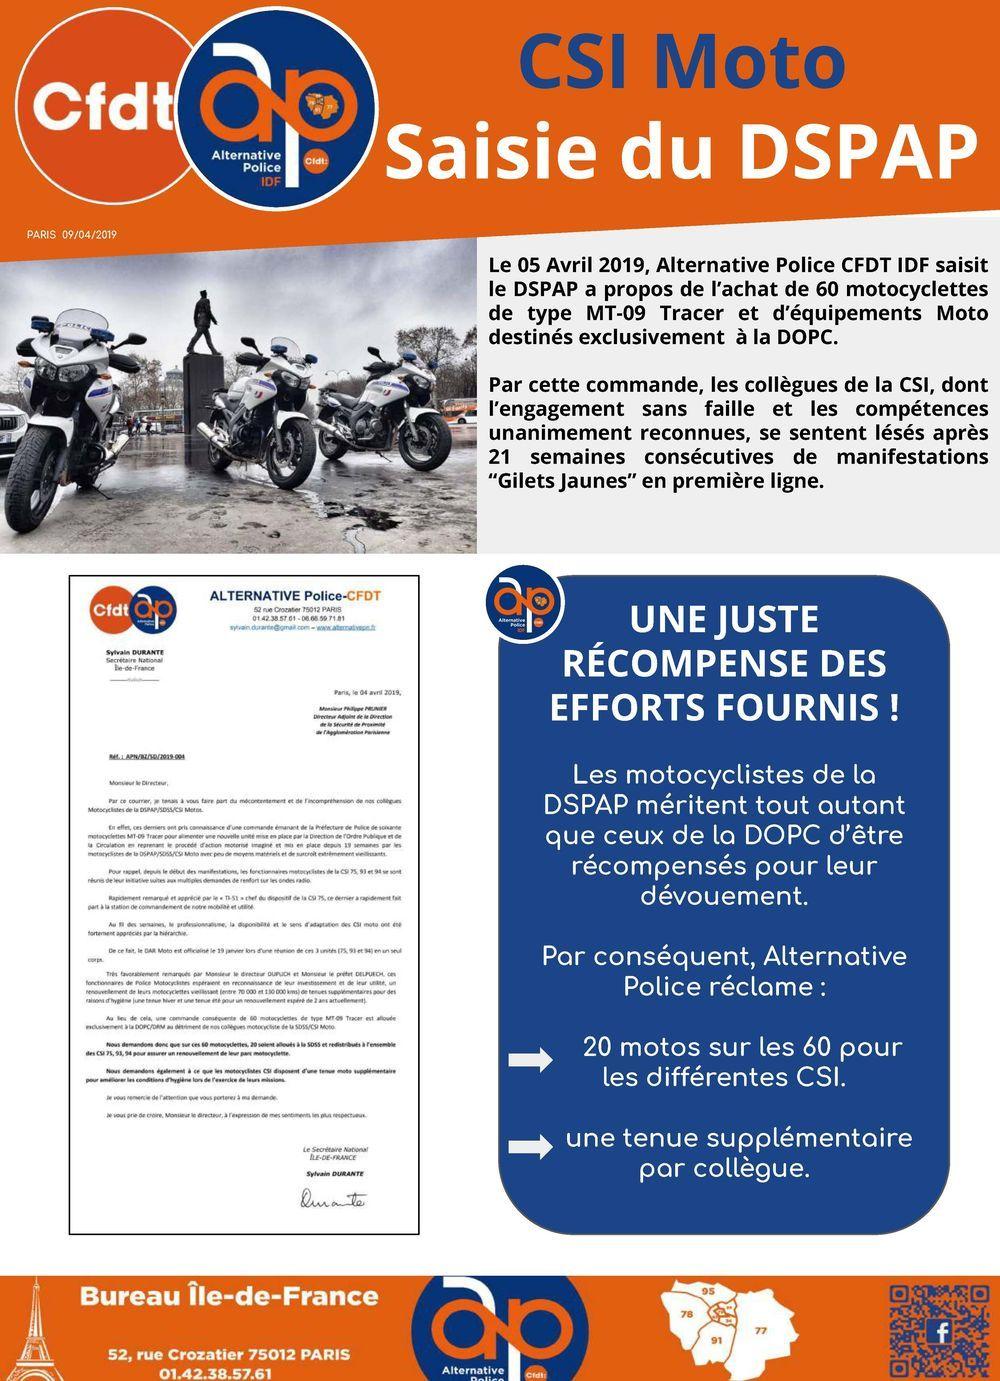 CSI Moto : saisie du DSAP